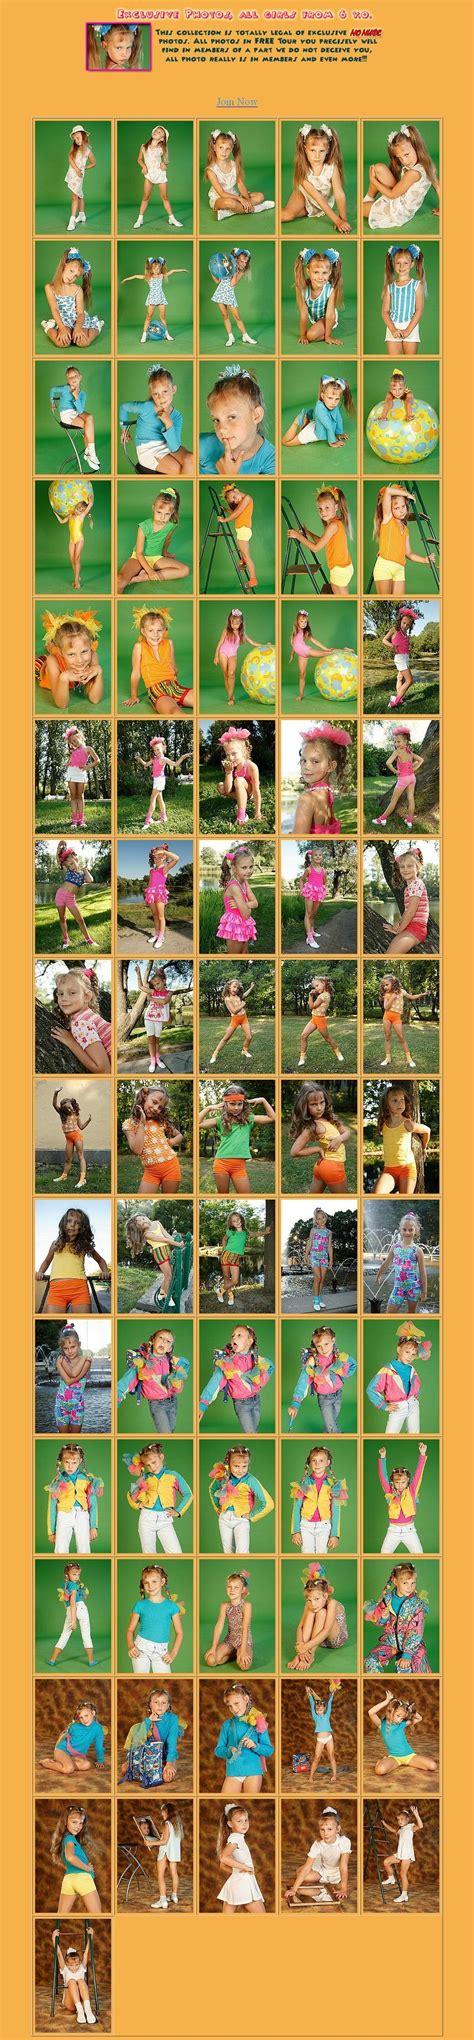 Мagazine Fashion 44 Only Sweet Girls